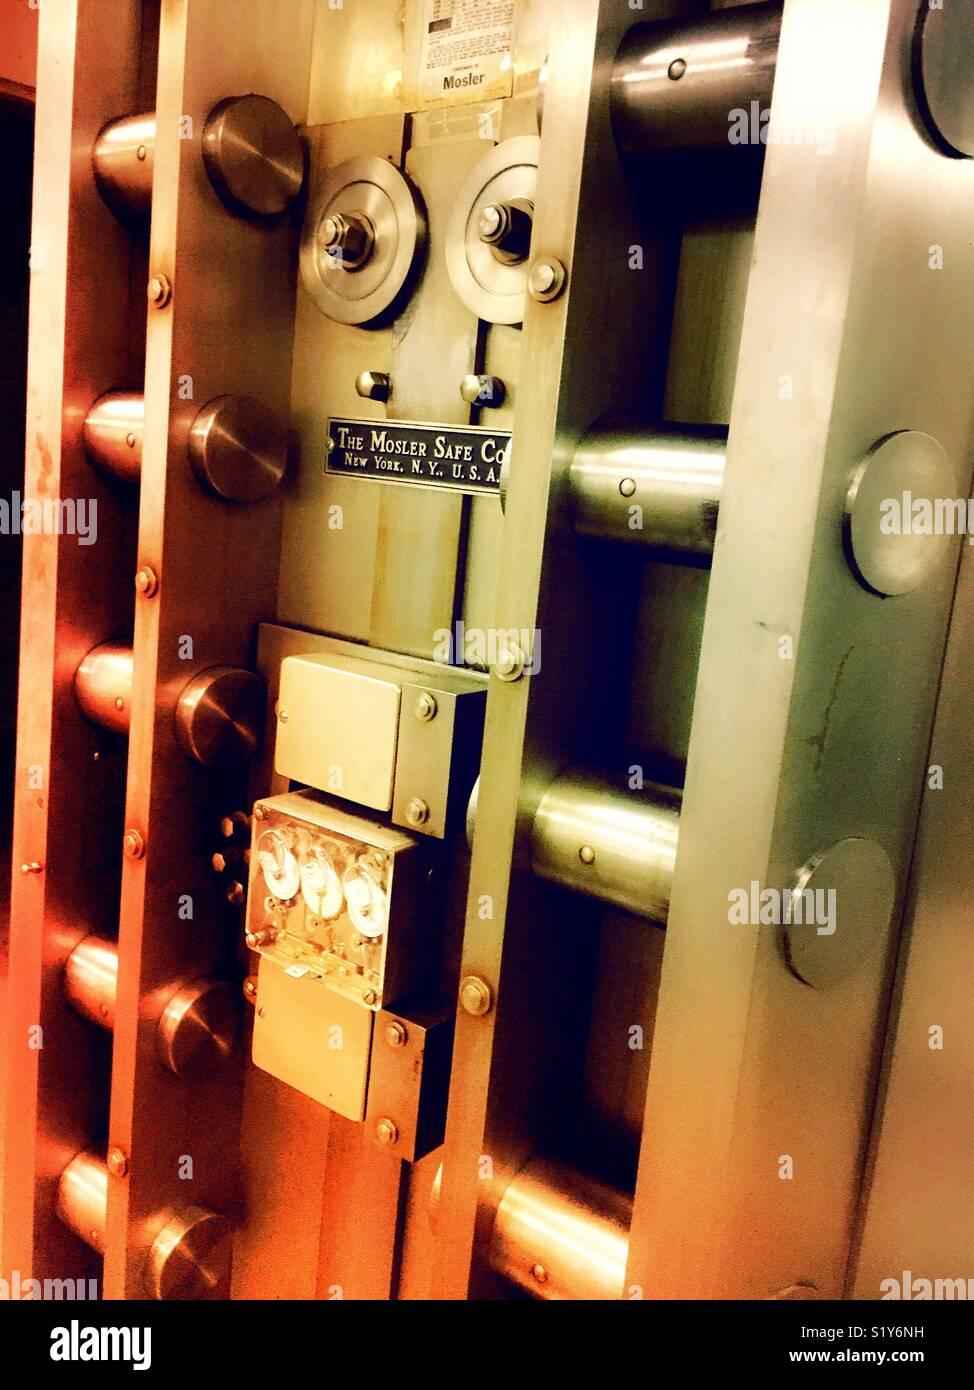 Vault locking mechanism on the inside of a large safe door, USA - Stock Image